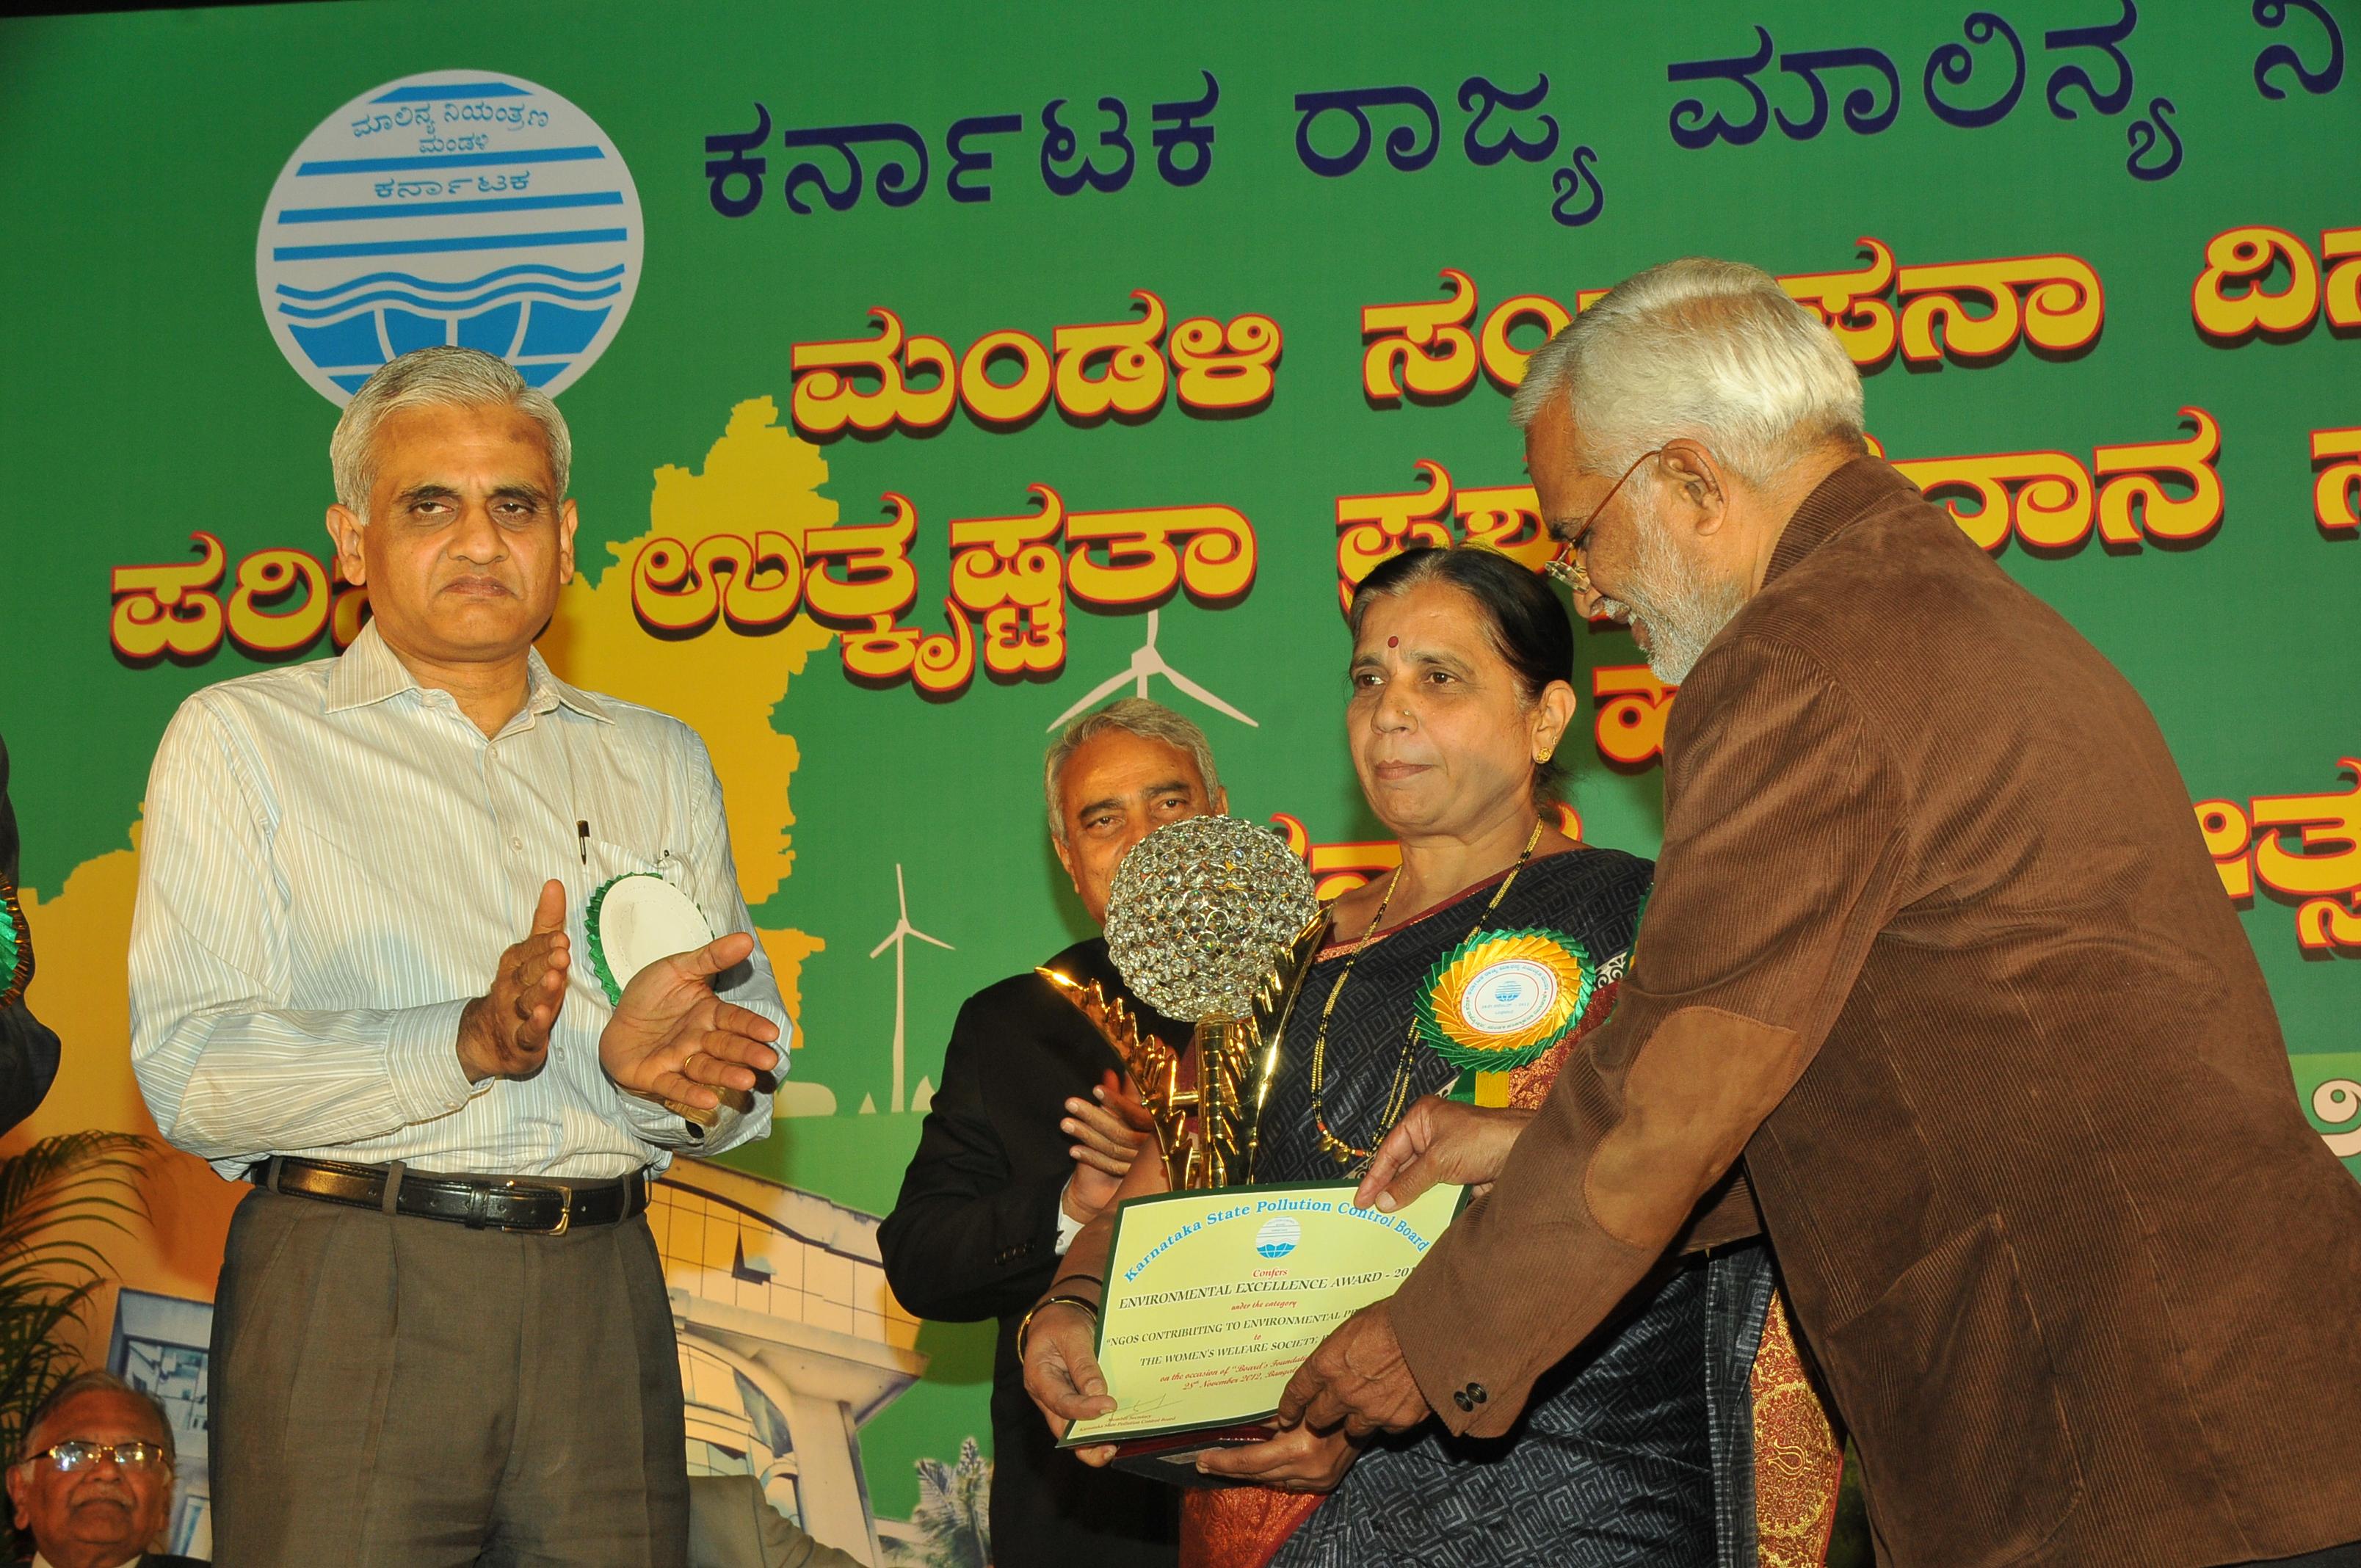 /media/womenswelfaresociety/IND-00003-WWSBELAGAVI-AWARDS-Environment_Excellent_Award_by_Govt._of_Karnataka_2012.JPG.JPG